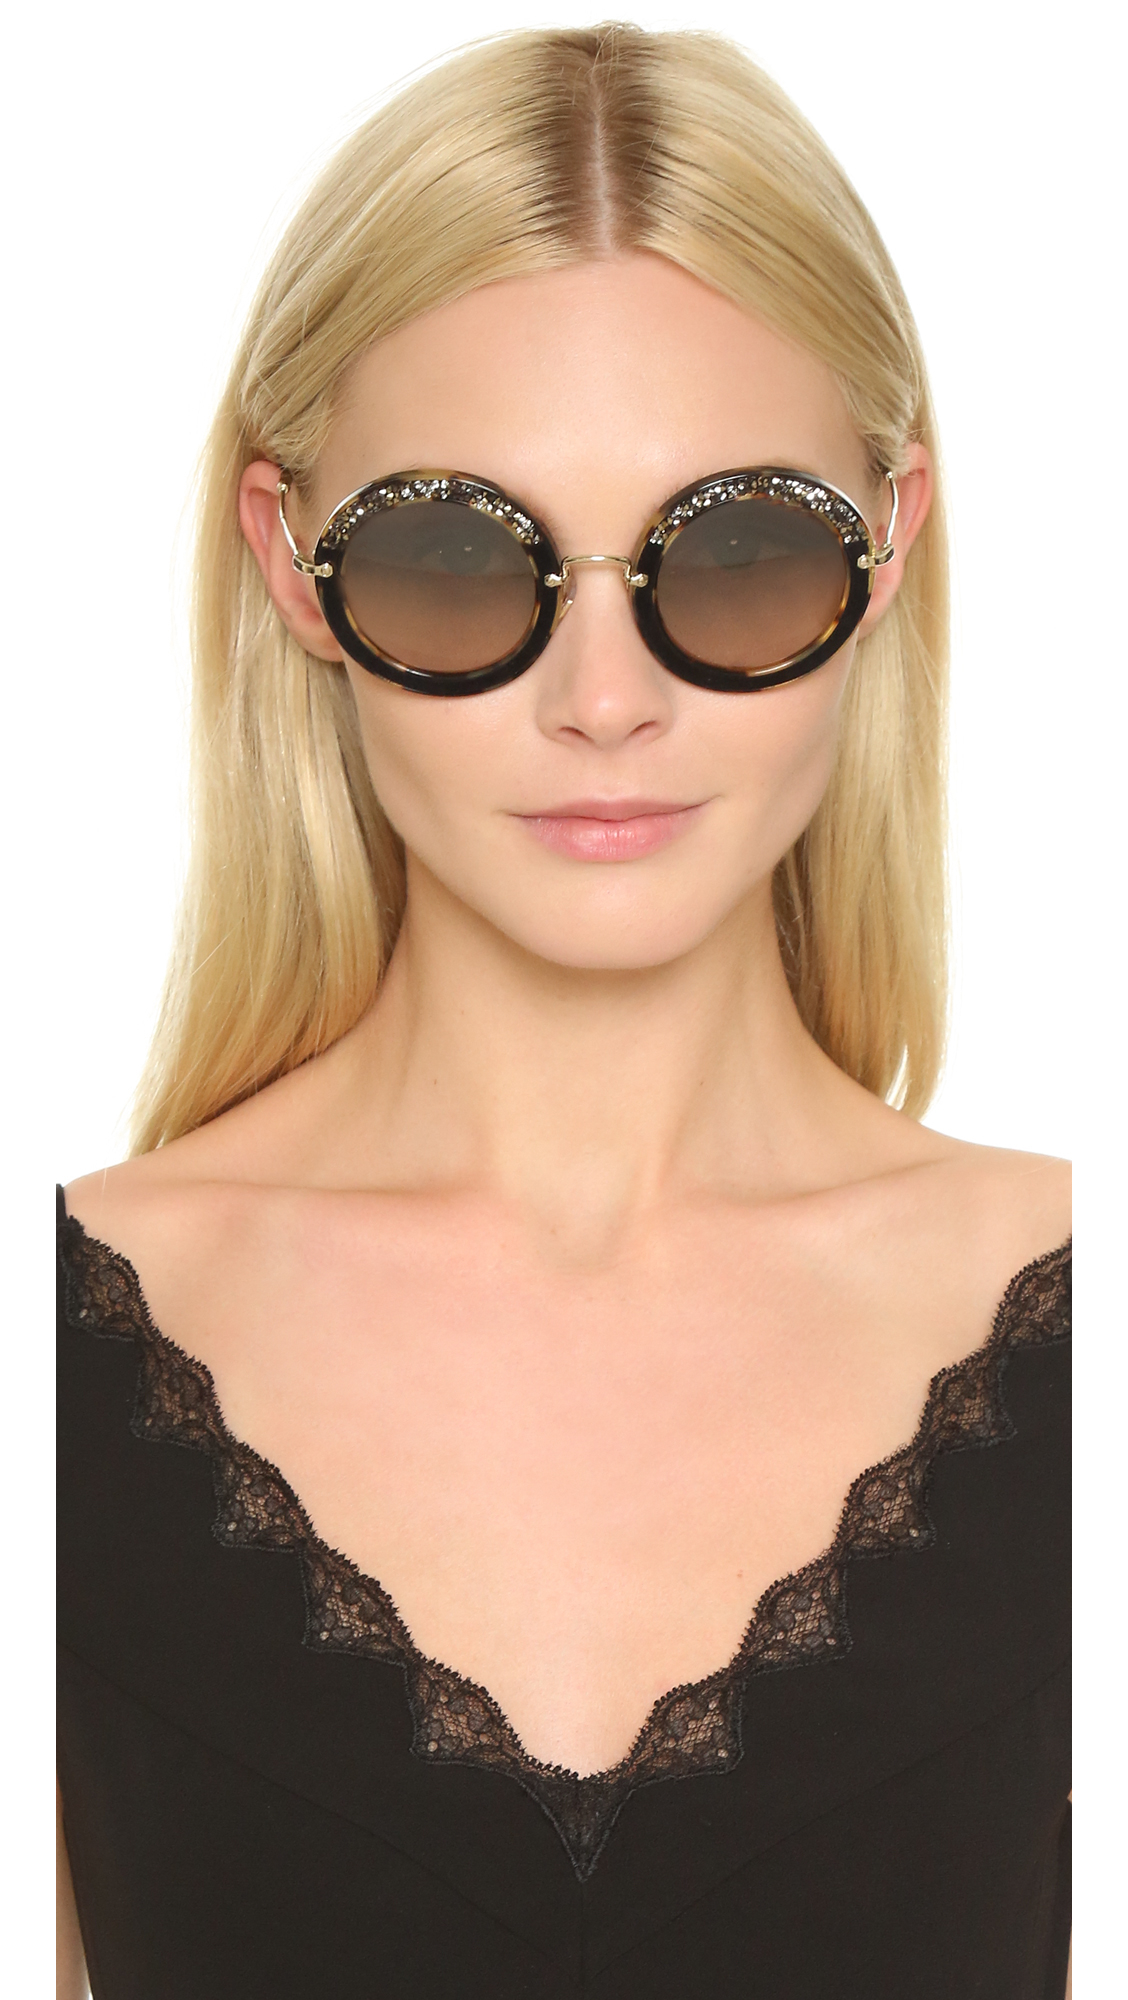 197a516f46f3 Miu Miu Round Crystal Sunglasses in Brown - Lyst